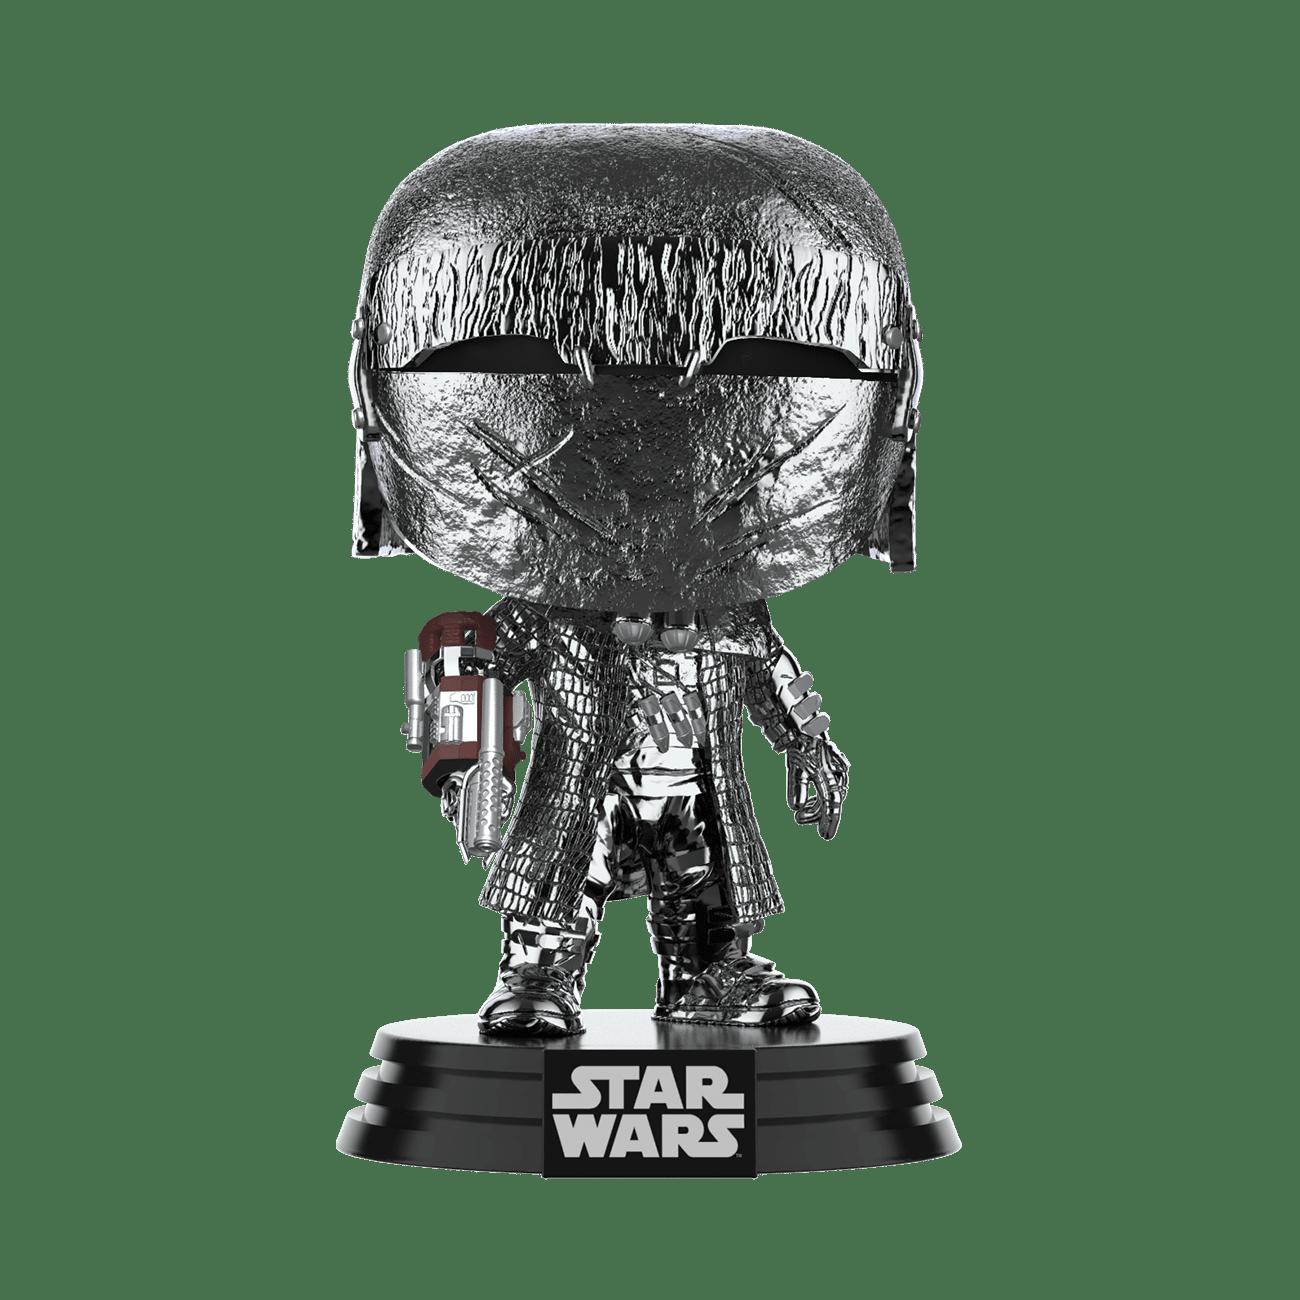 Funko Star Wars: The Rise of Skywalker Hematite Chrome Knight of Ren Cannon Pop! Vinyl Figure